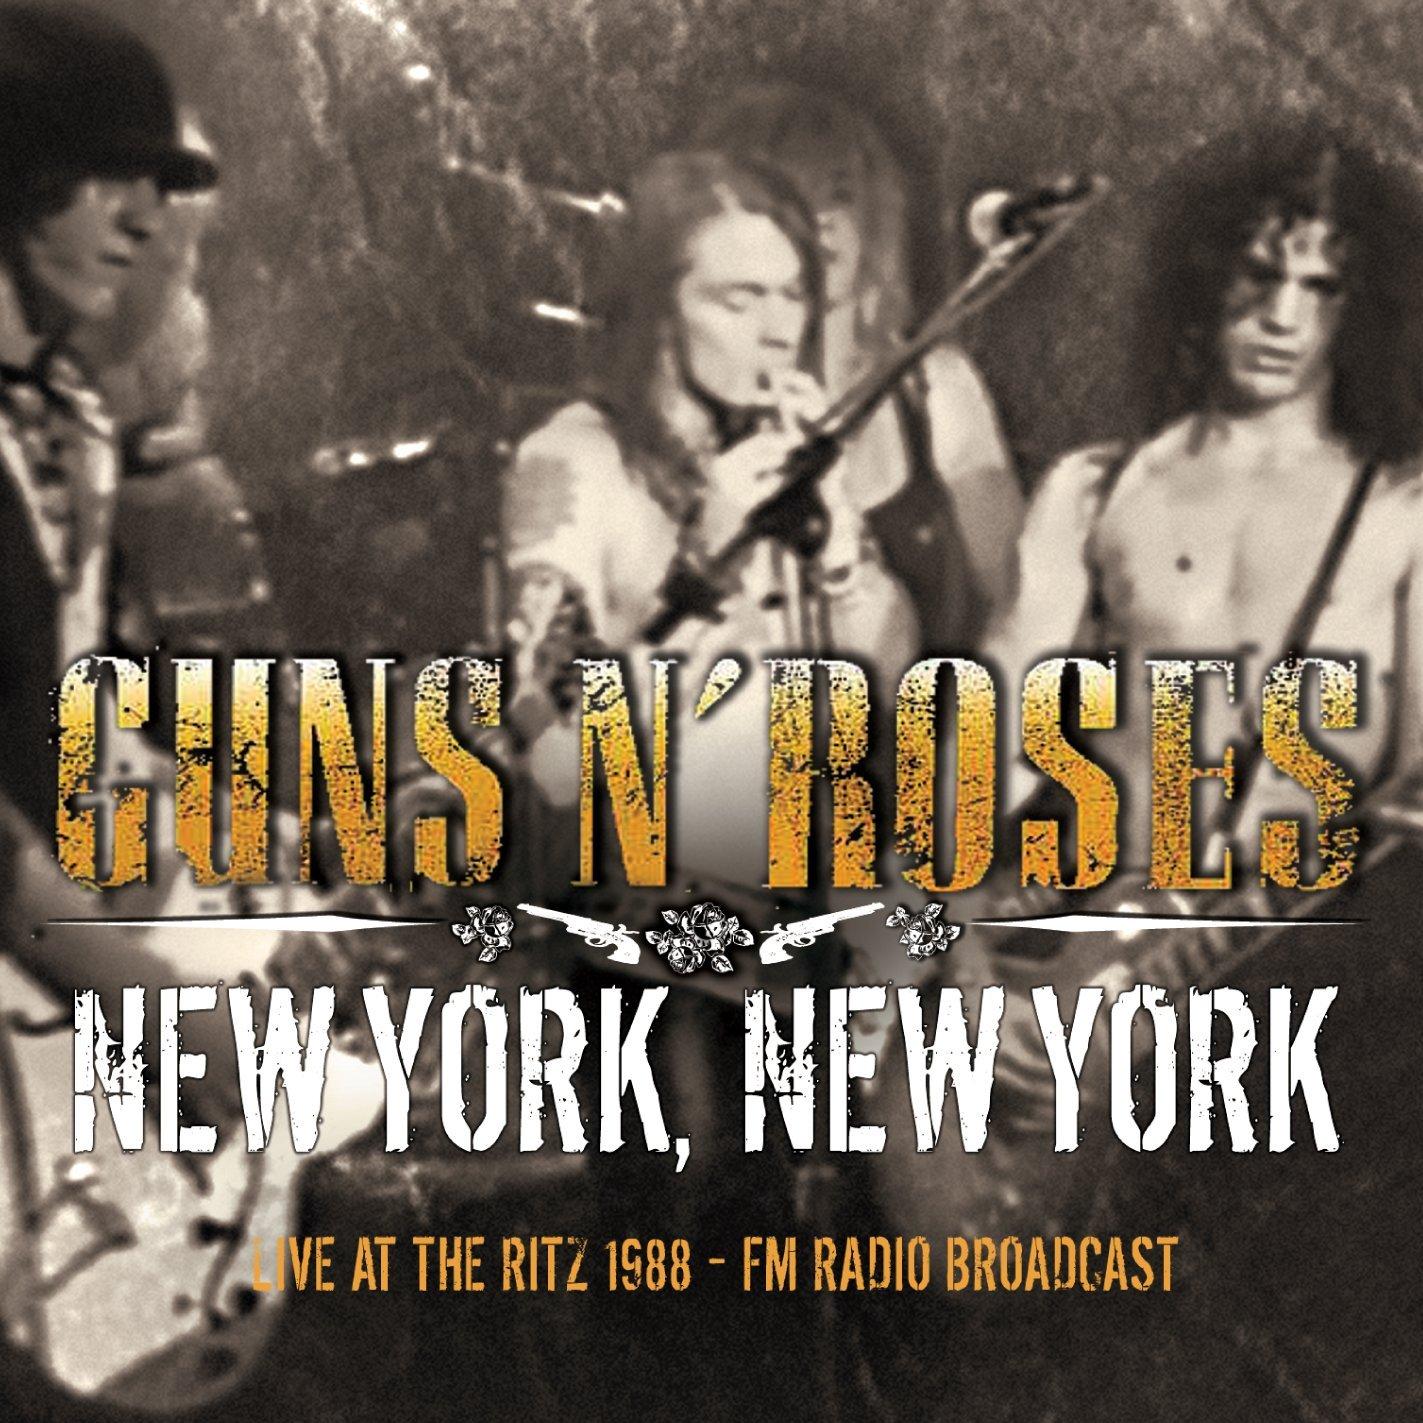 Guns N Roses Roses. New York